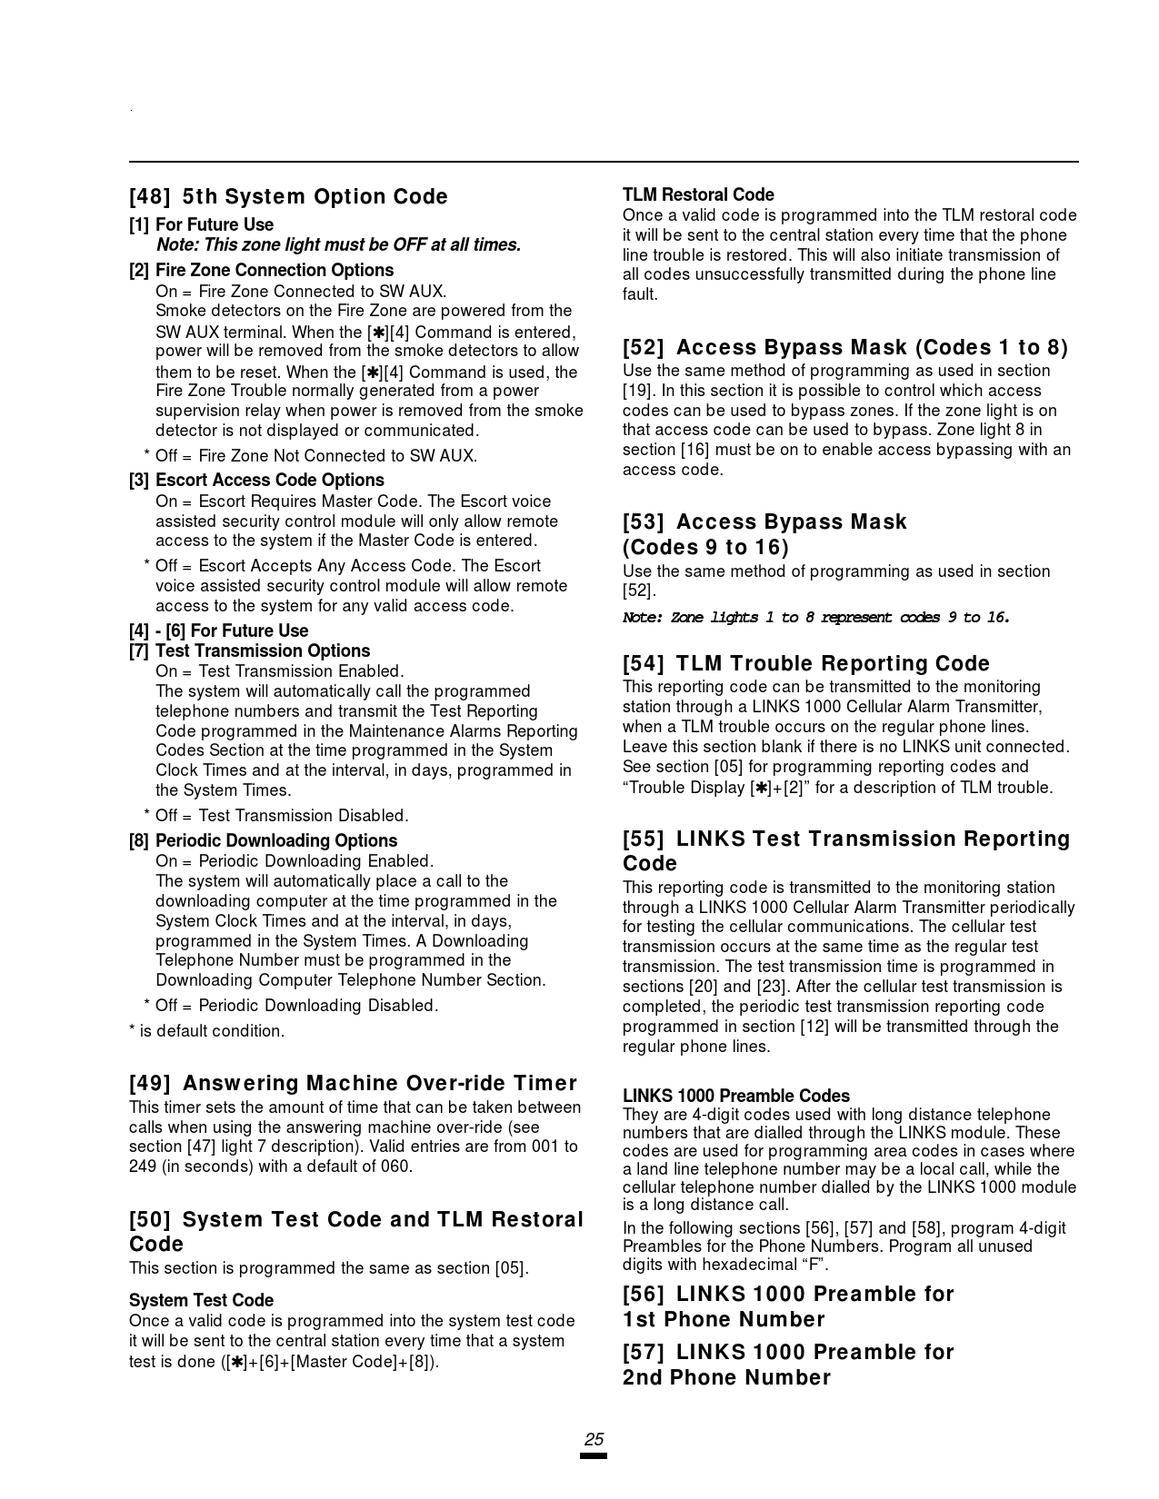 DSC pc2550 v1-3 im eng 29000592 r2 by Sertek Servicios Tecnologicos